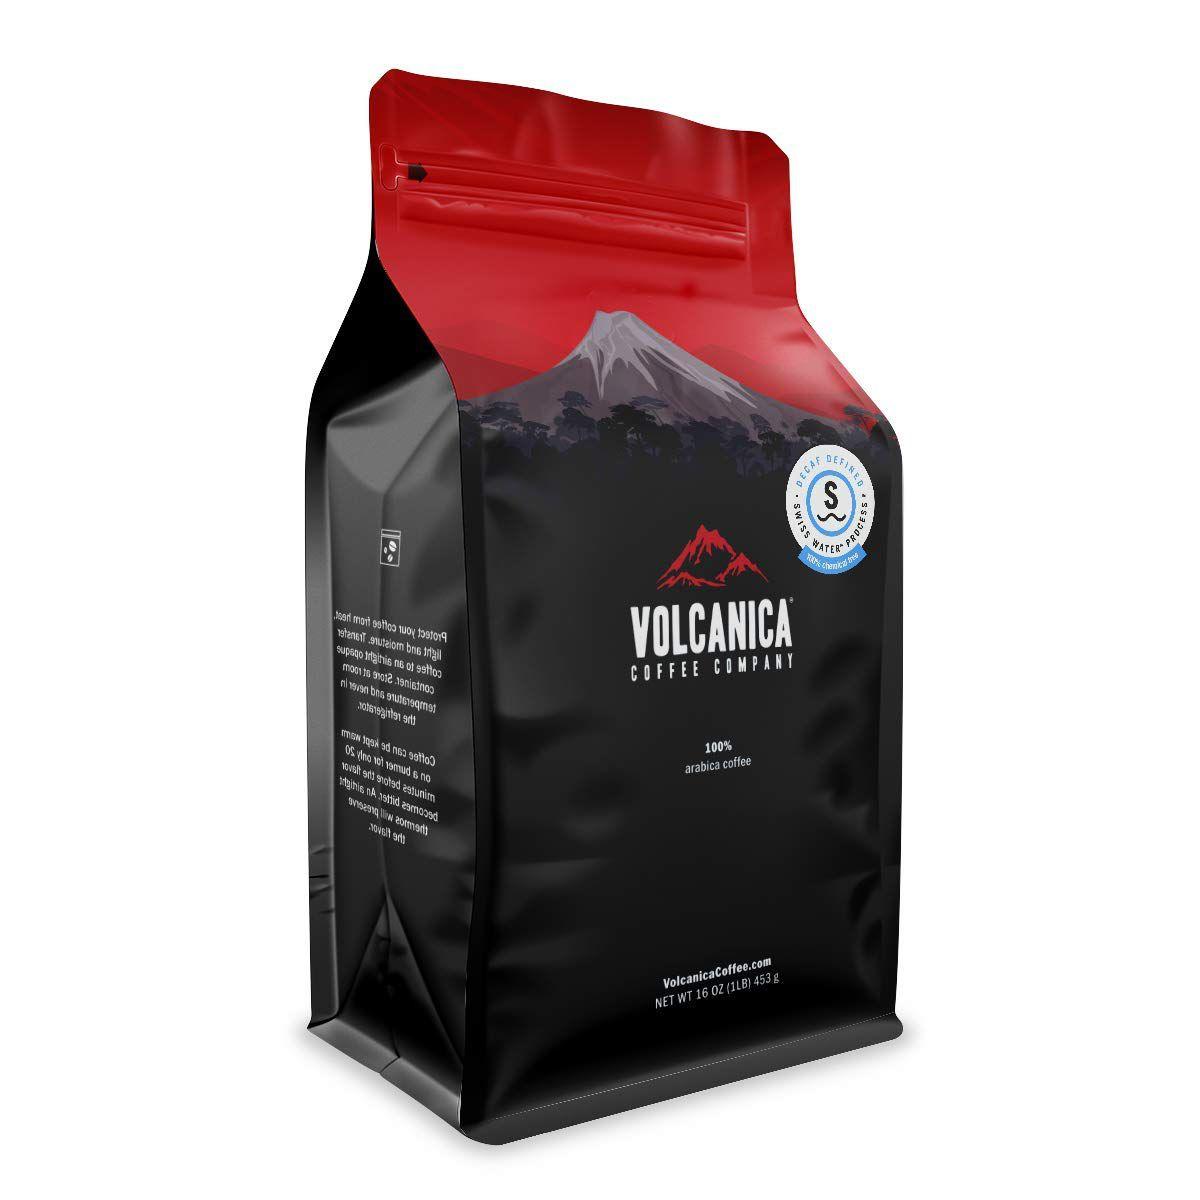 Volcanica Coffee Company House Decaf Coffee